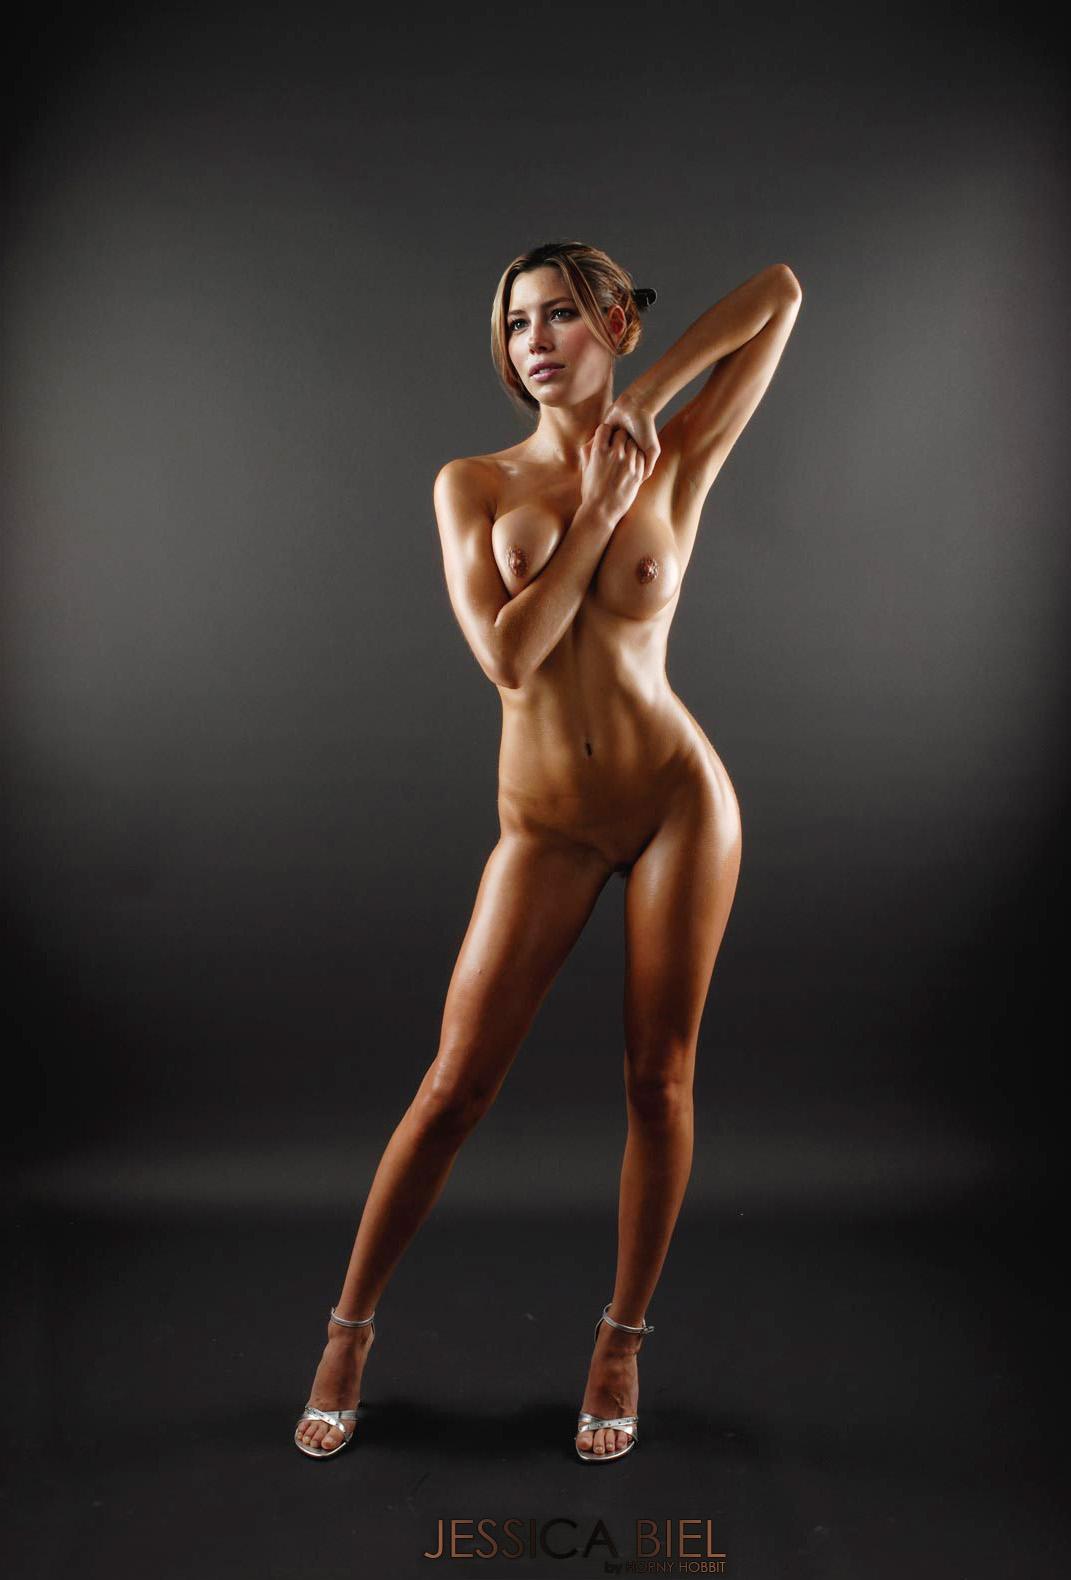 jessica biel naked fakes